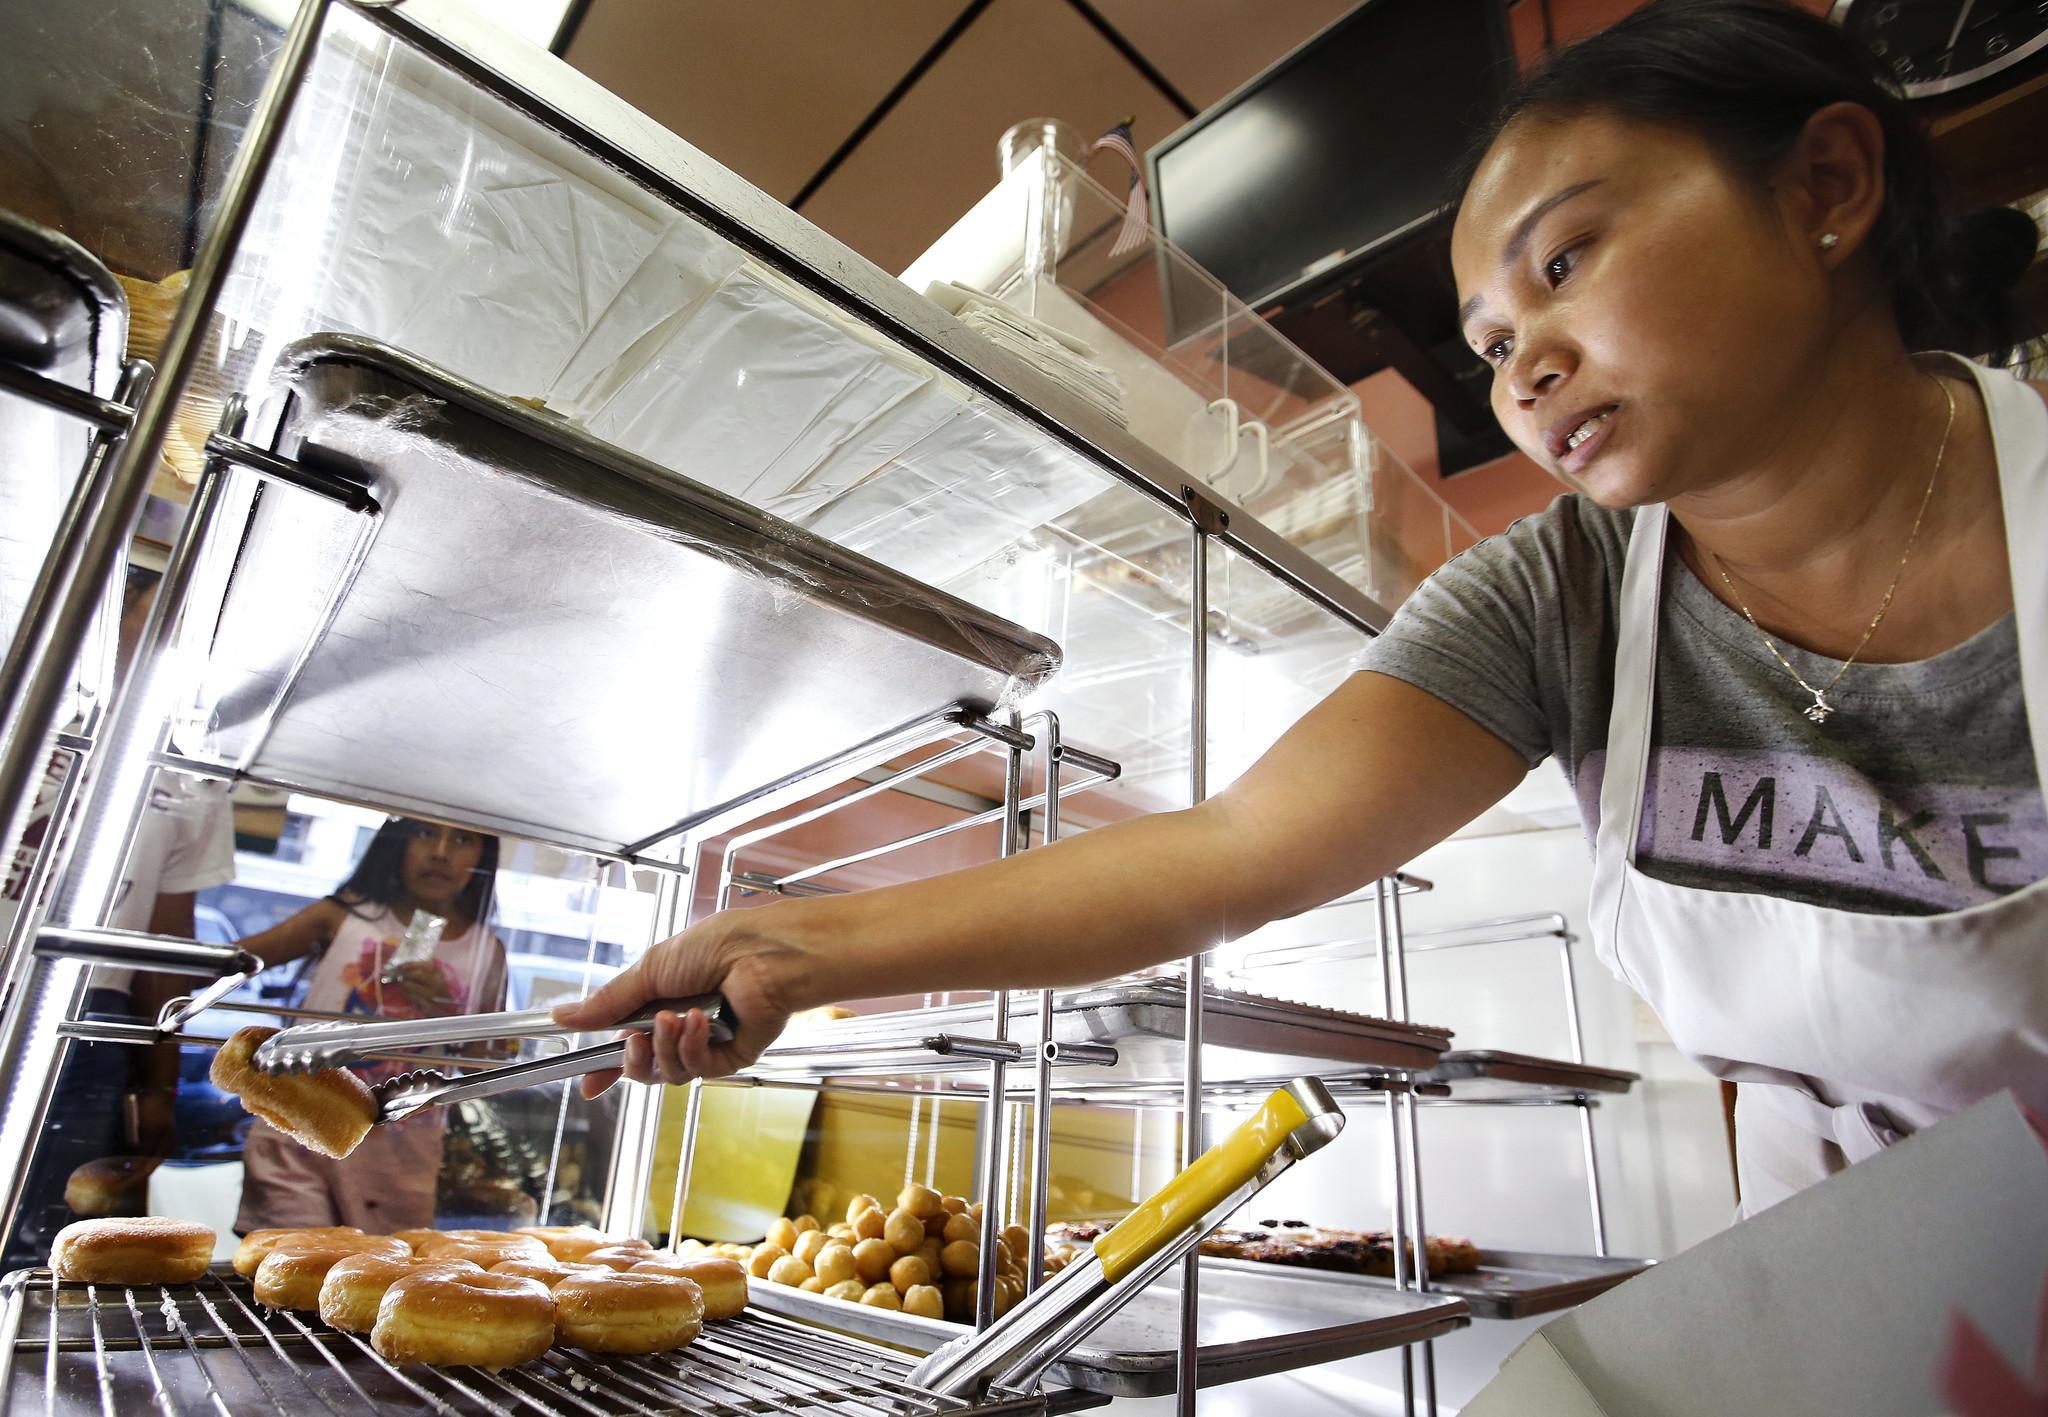 Srim Chhun, owner of Christina Donuts, fills a customer's order.